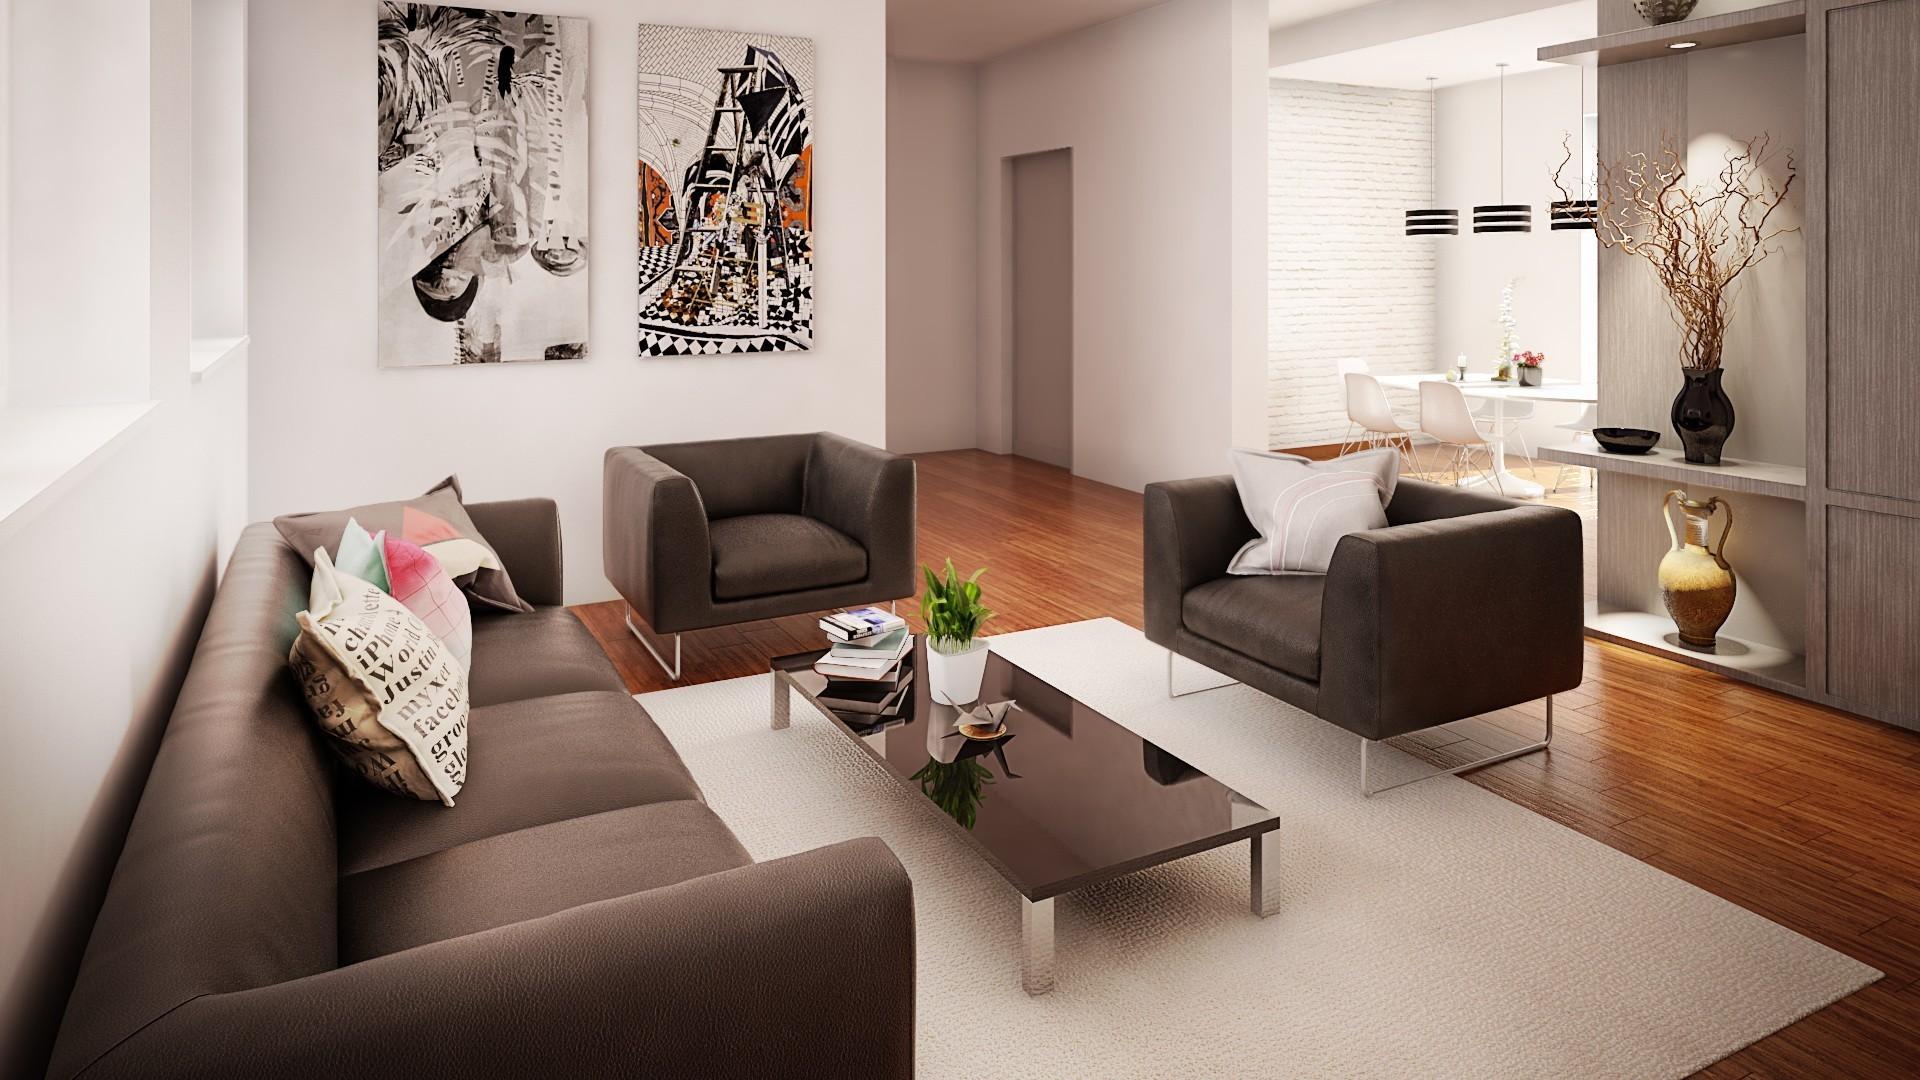 Dnevna soba stana od 160 m2